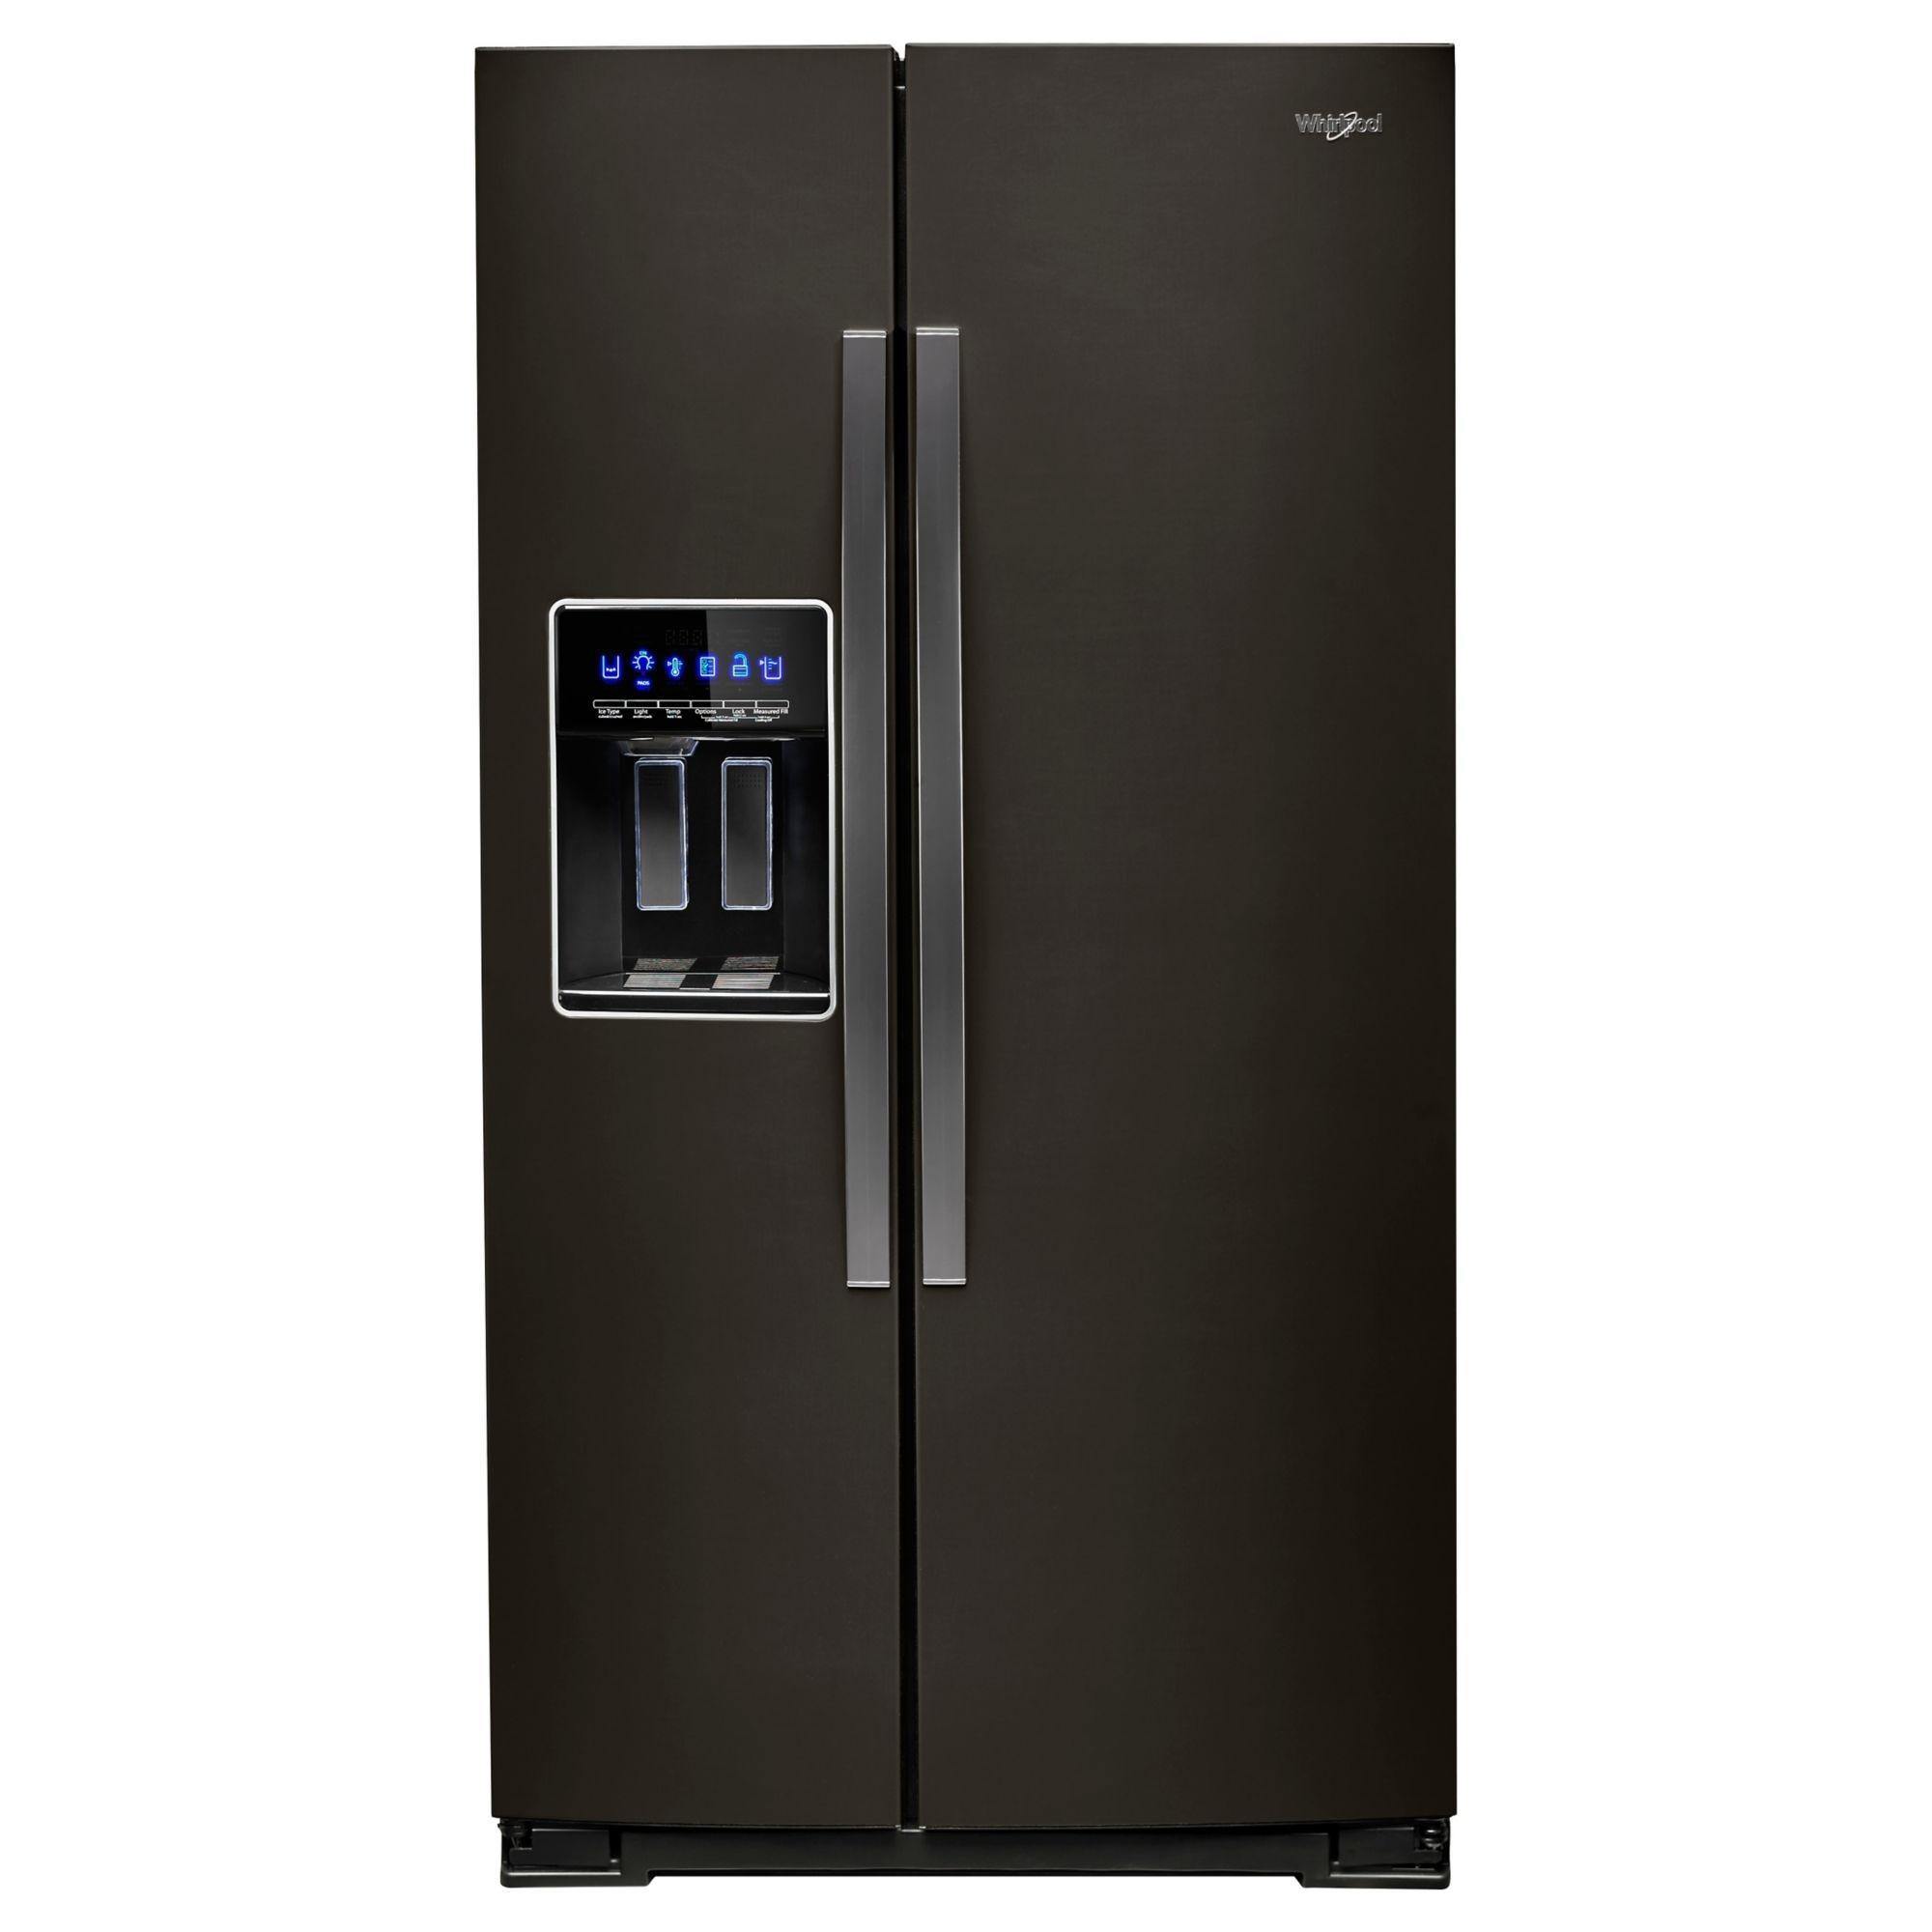 6 Pallets of Seasonal & Major Appliances, Deck Boxes & More Ext. Retail $15,587, Uxbridge, MA